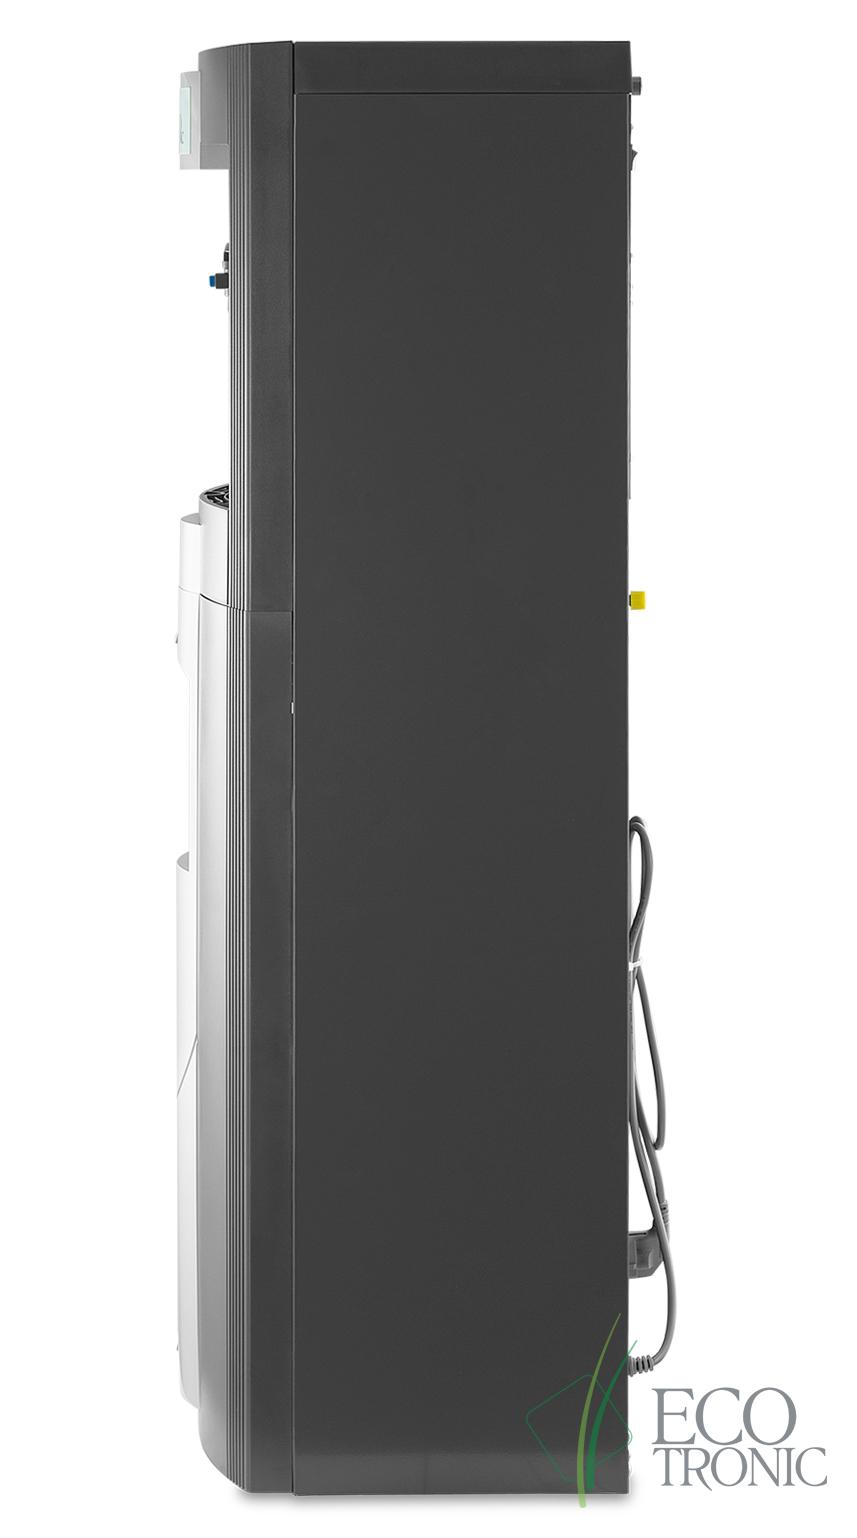 Пурифайер Ecotronic B50-U4L BLACK-SILVER